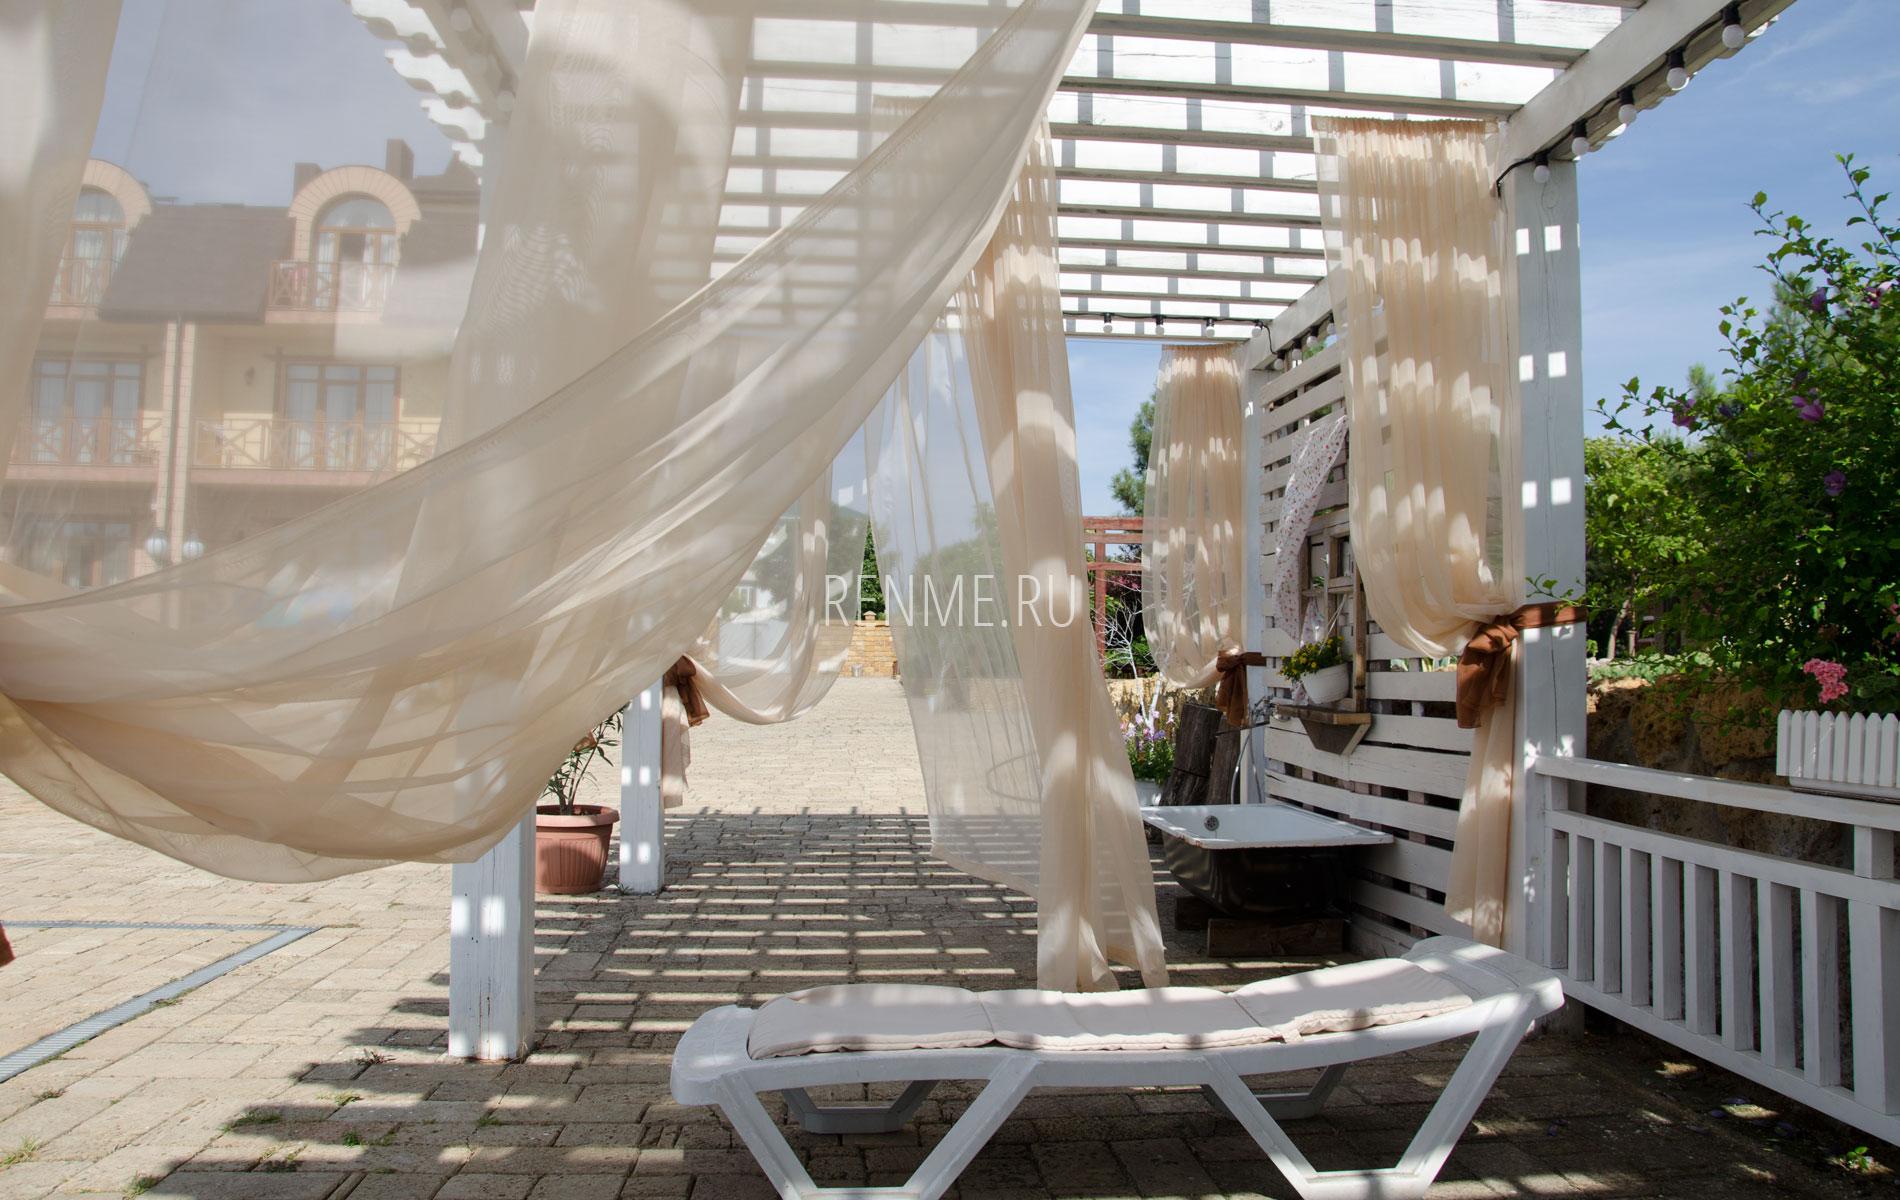 Зона отдыха с шезлонгами. Фото Евпатории